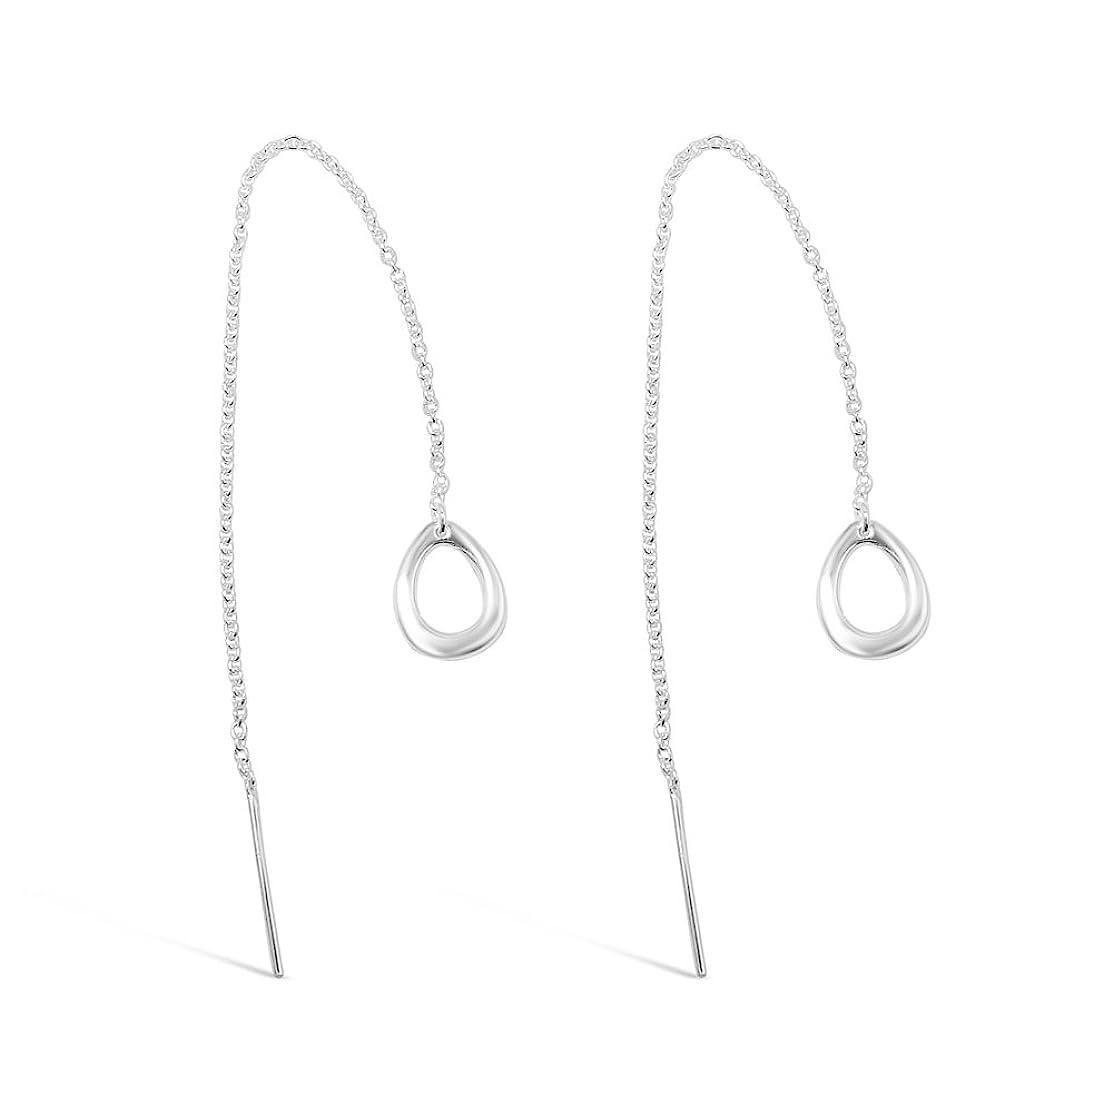 925 Solid Sterling Silver Long Dangling Teardrop Threader Hoop Earrings, Tall Dangle Circle Chain Jewelry